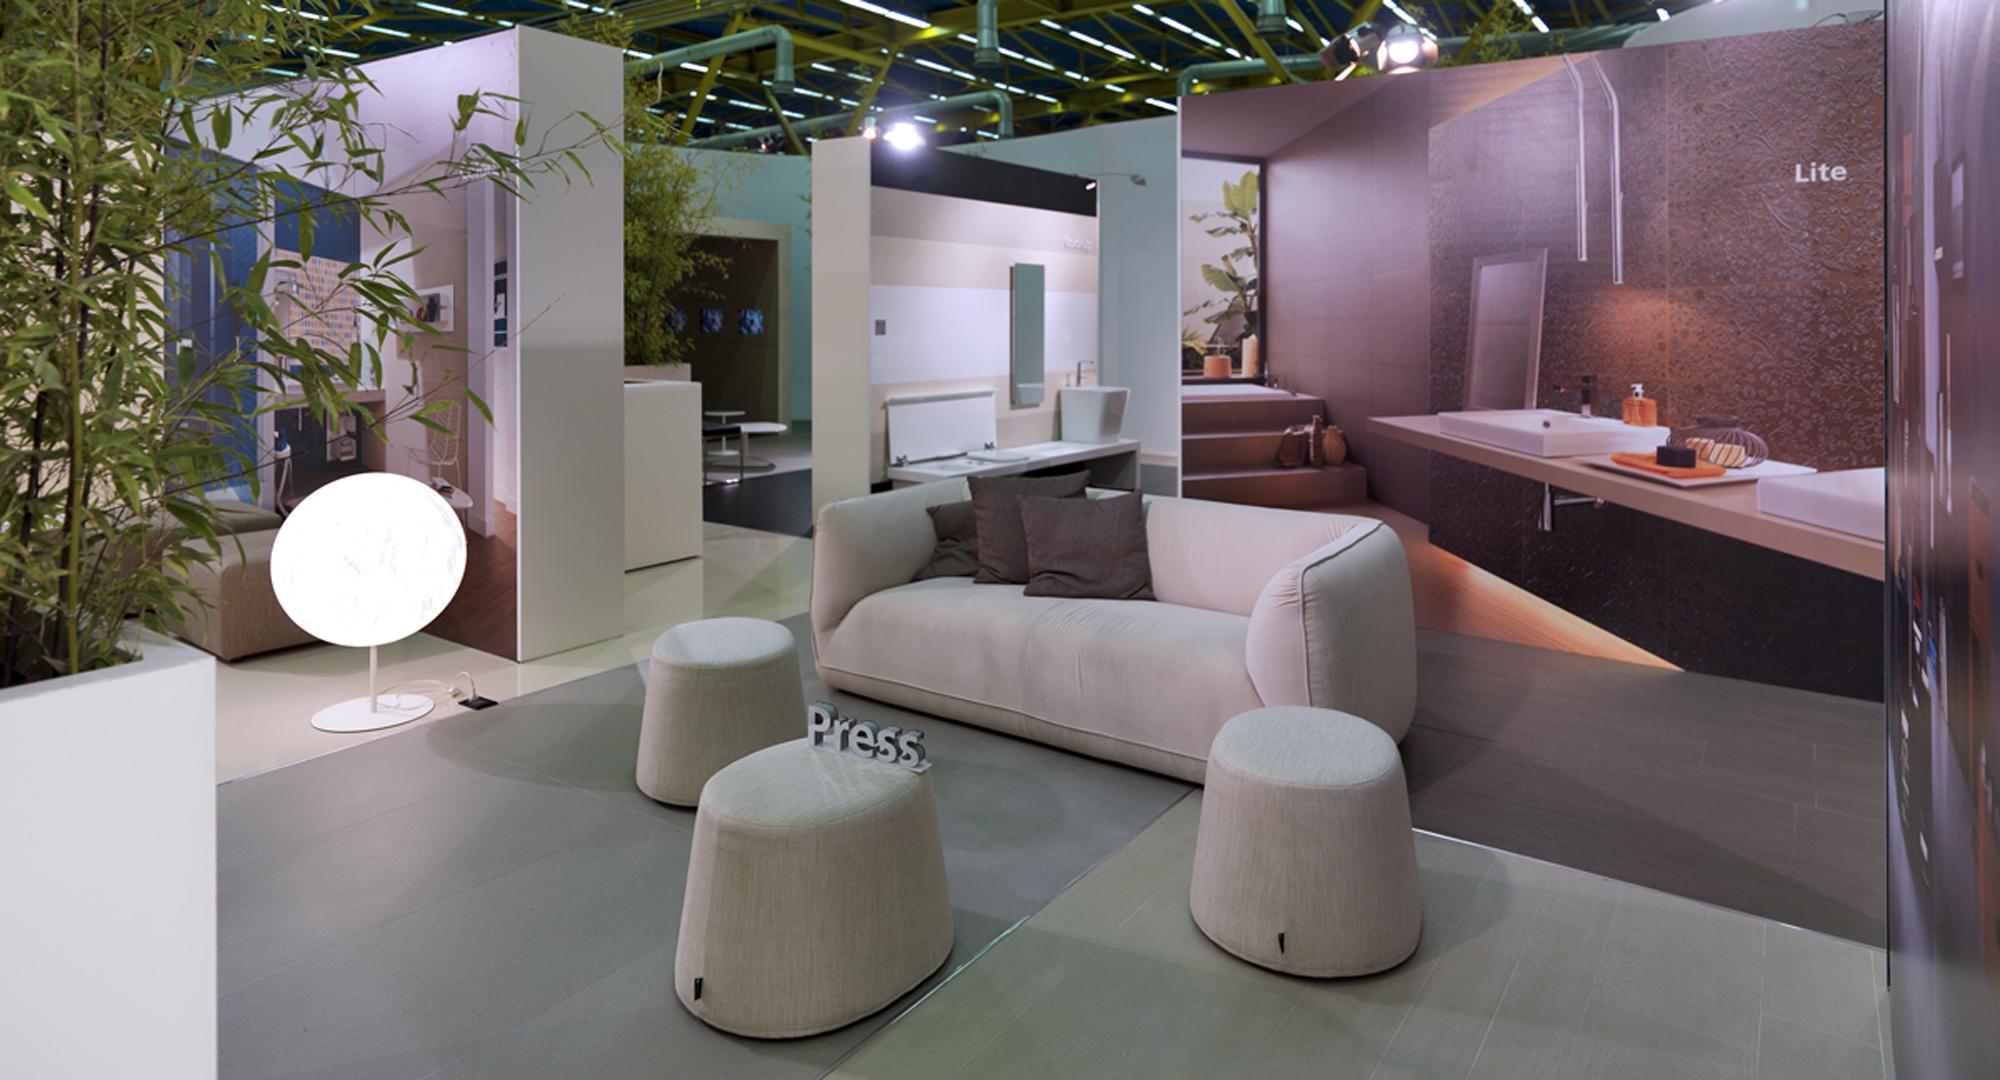 cersaie 2011 for marazzi group uainot. Black Bedroom Furniture Sets. Home Design Ideas